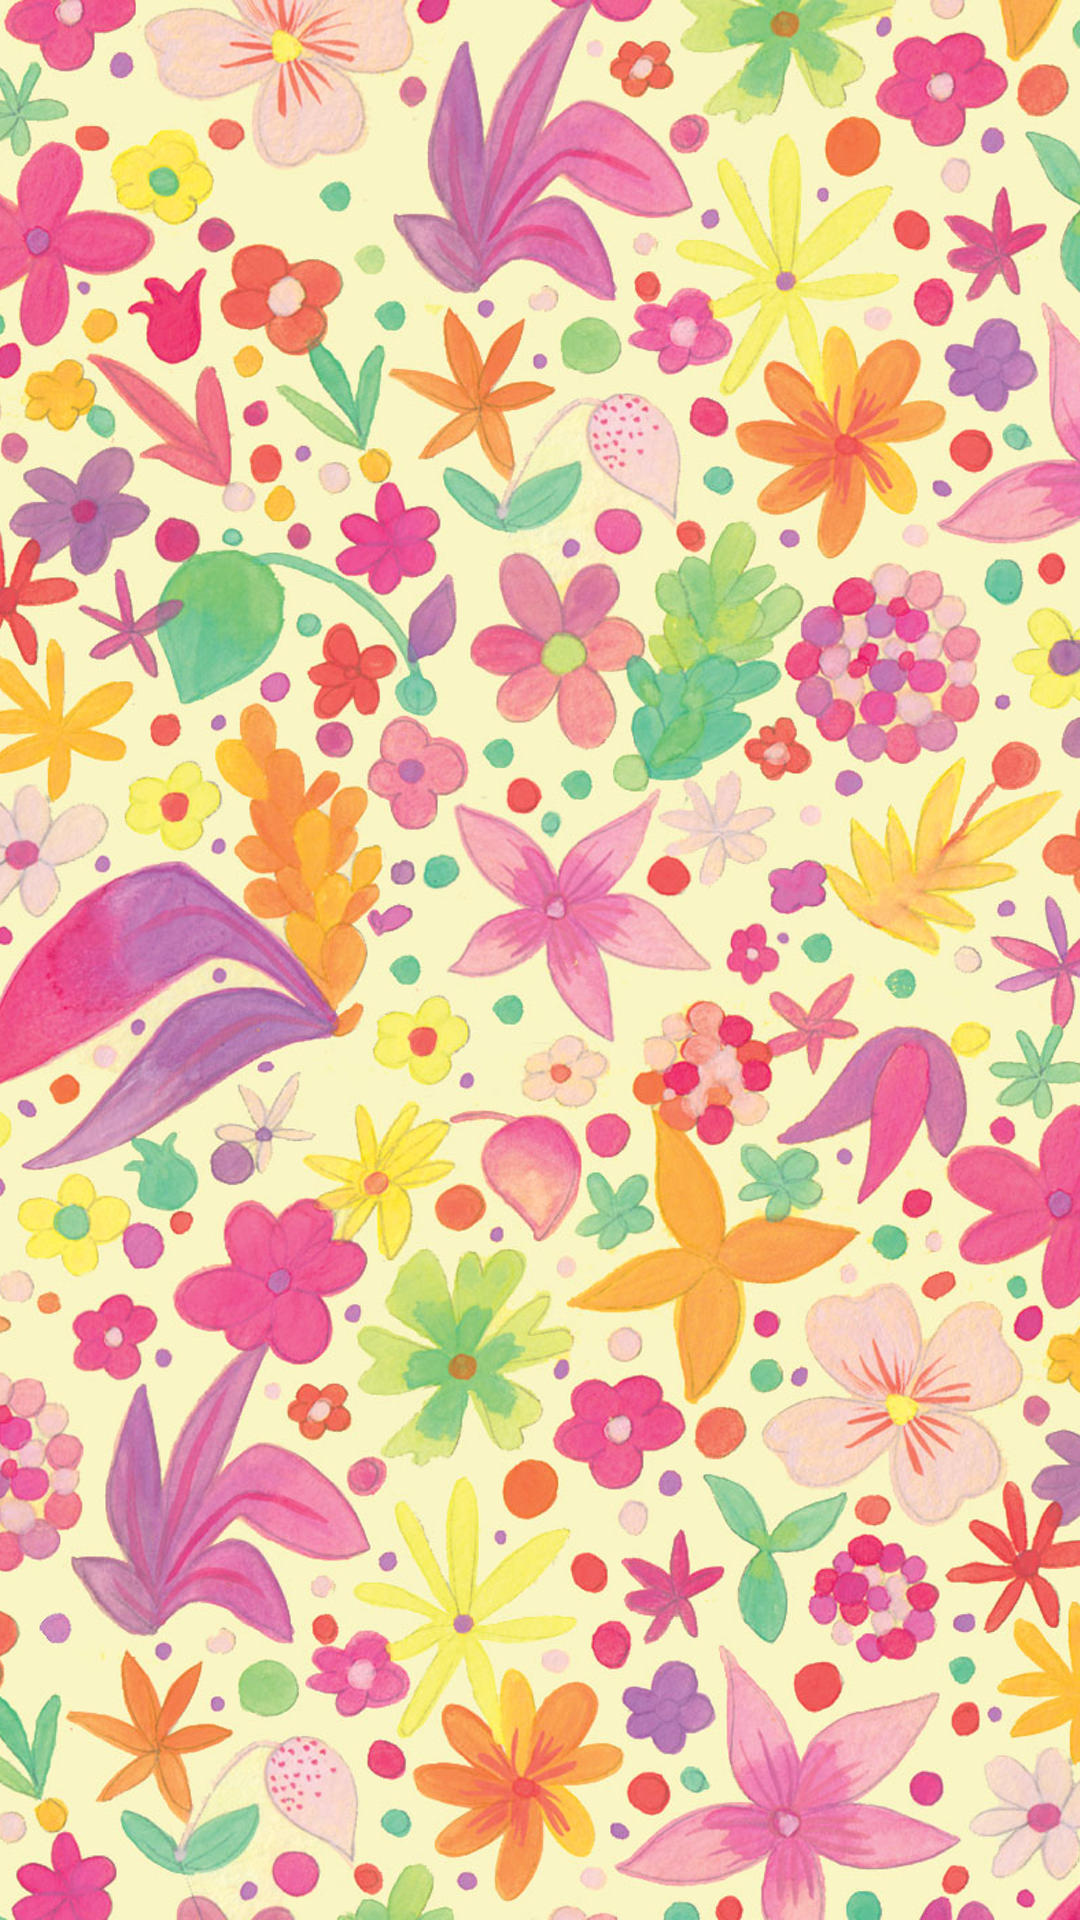 Floral Iphone Wallpaper Iphone Wallpaper